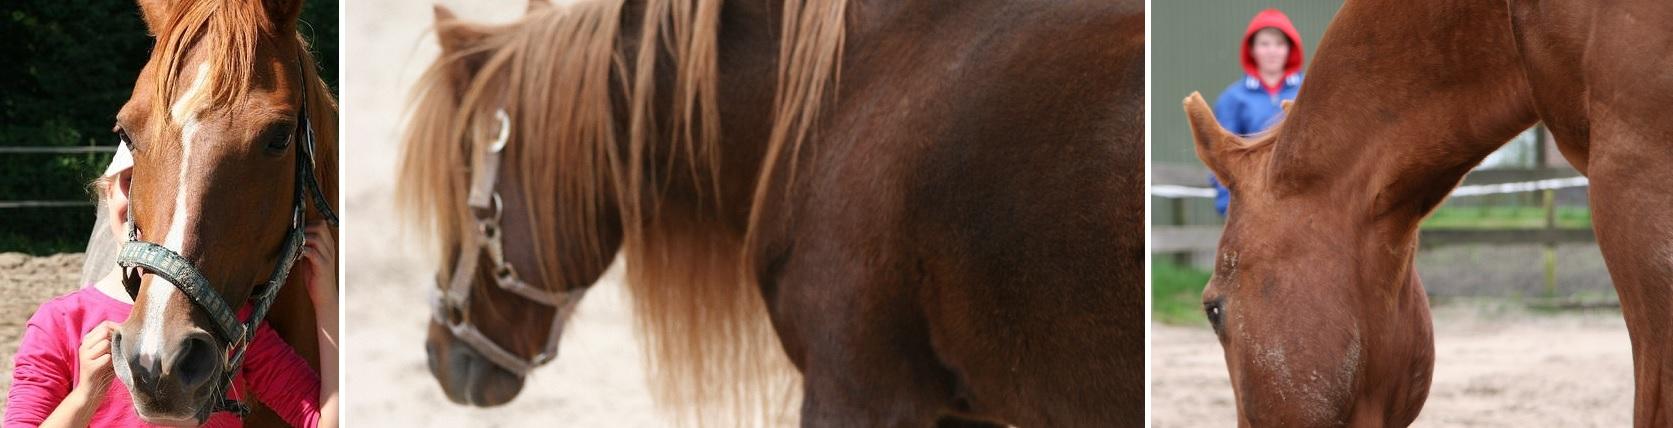 Paard & Gezin